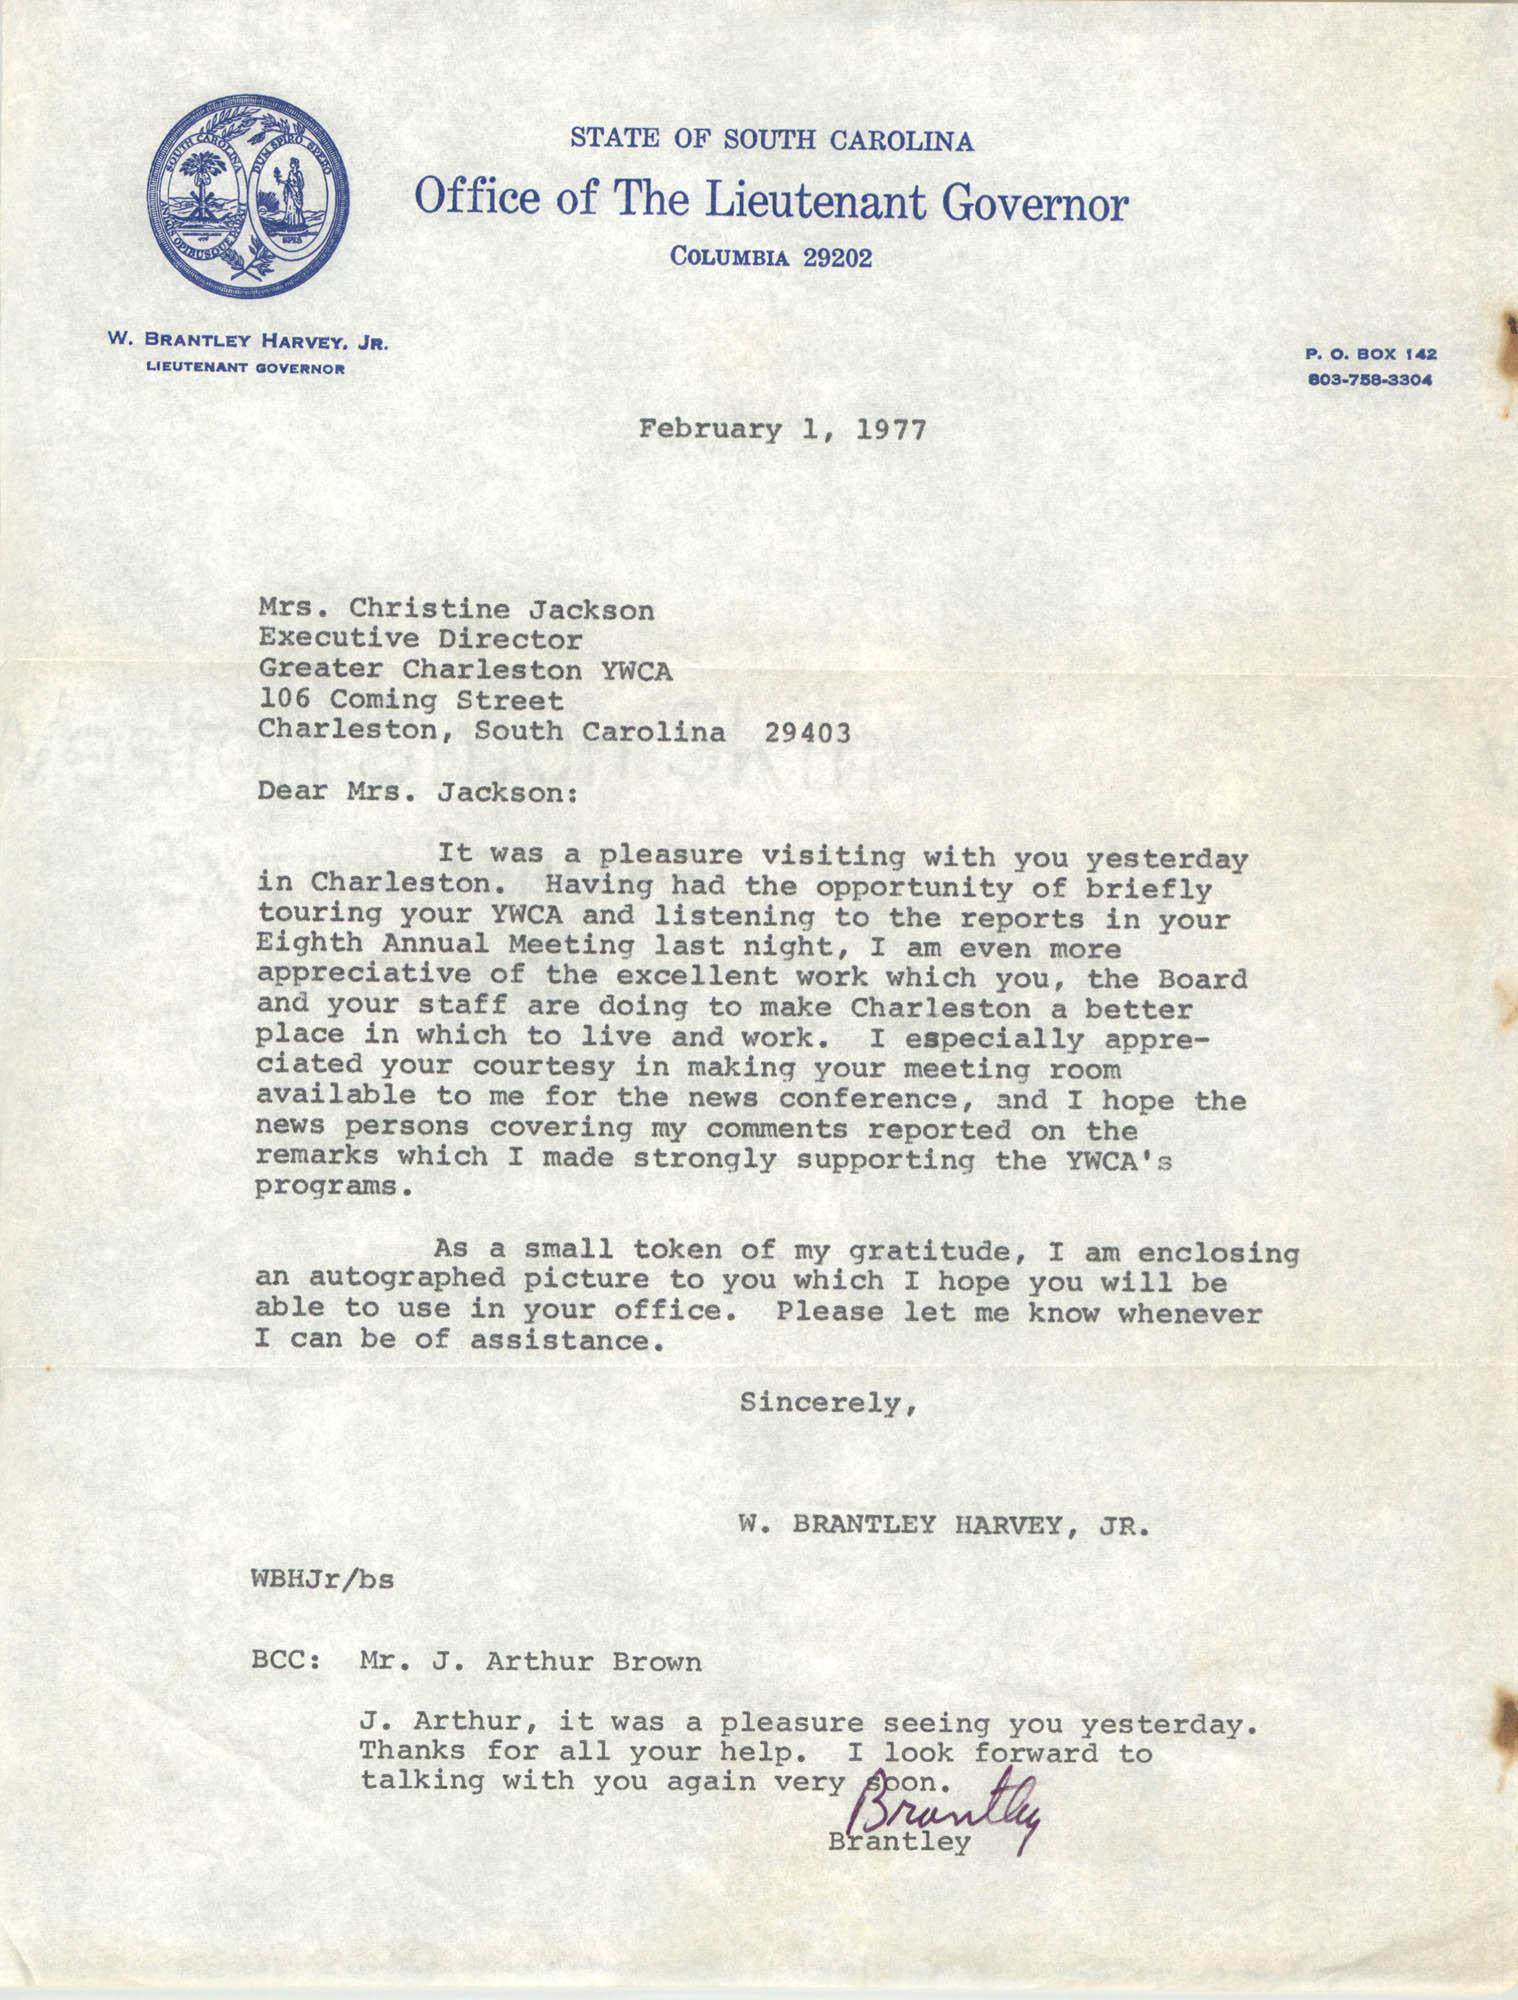 Letter from W. Brantley Harvey, Jr. to Christine Jackson, February 1, 1977